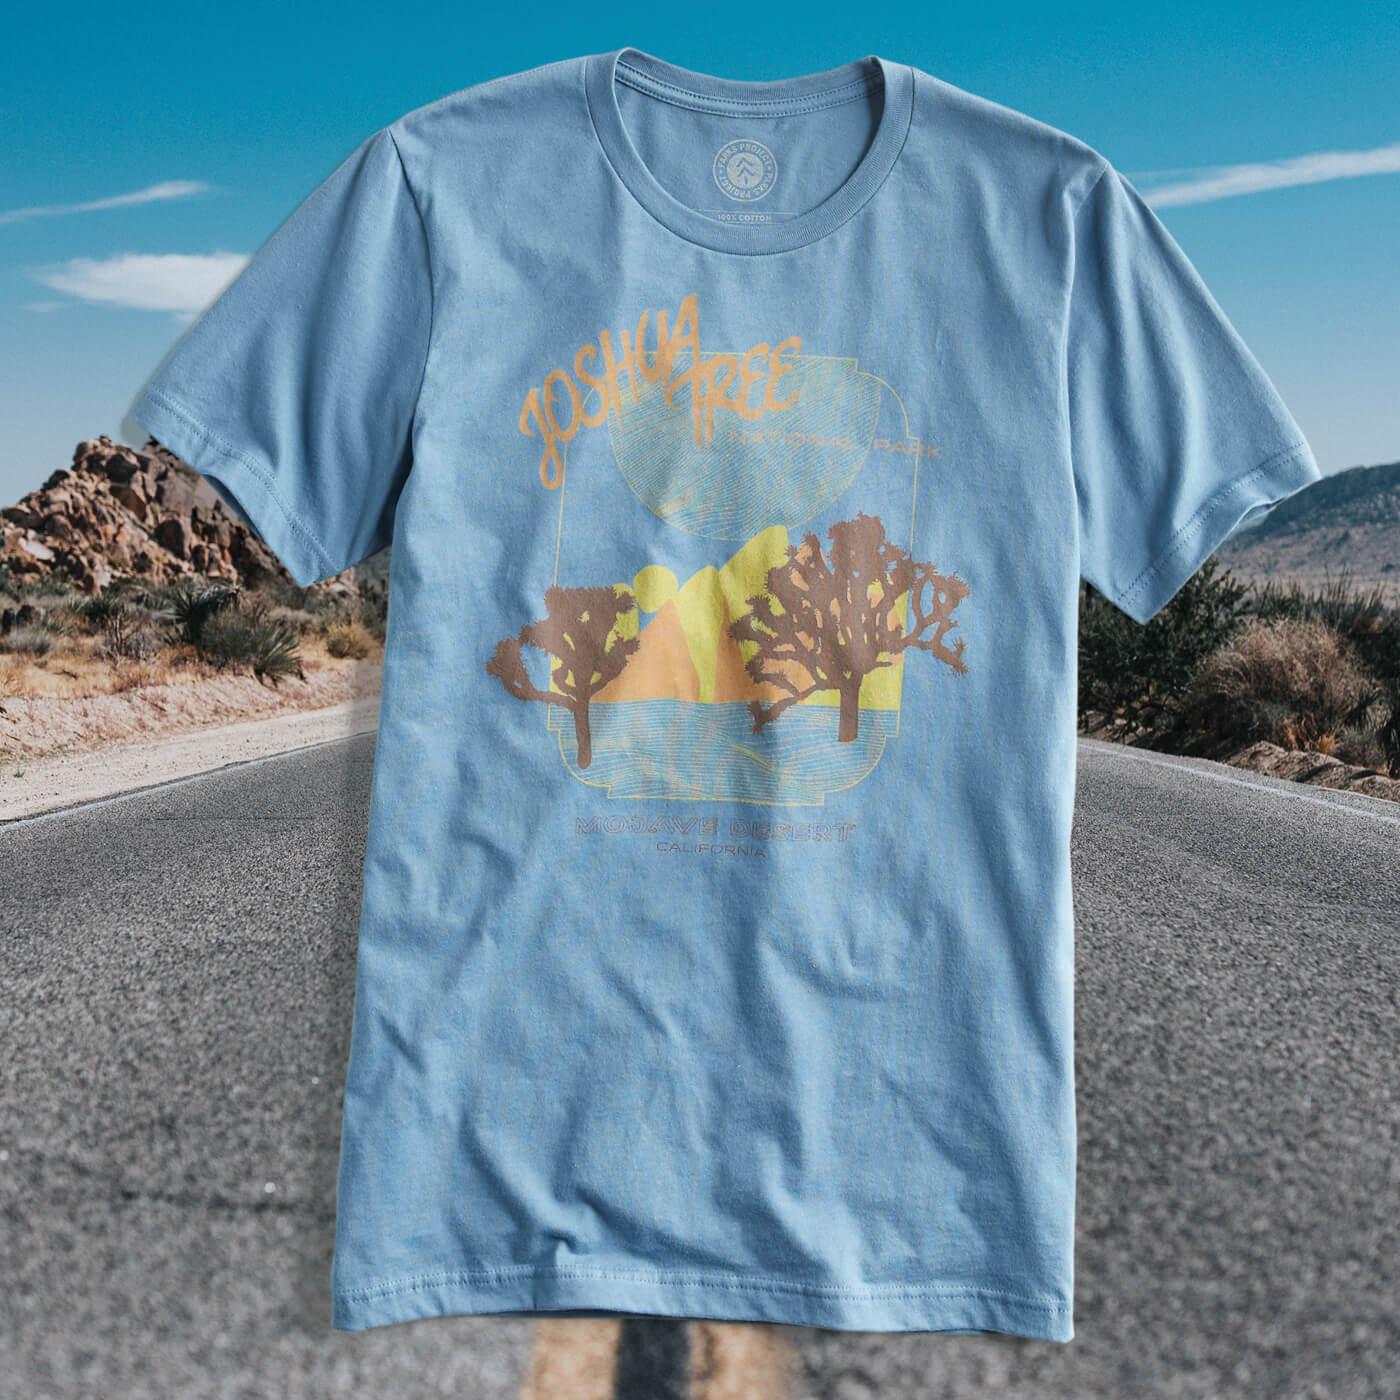 M_BLG_-Tee-Shirt-Guide_61